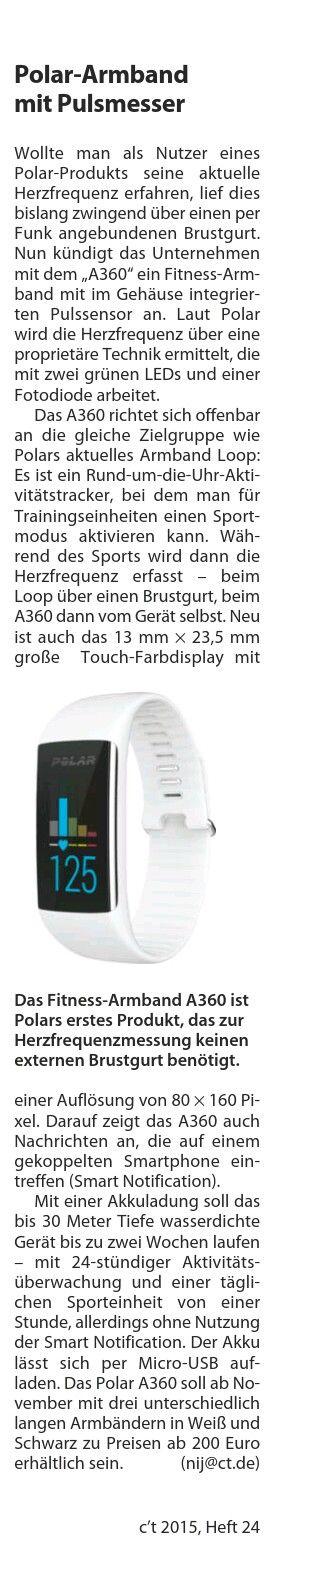 Polar armband mit HFM